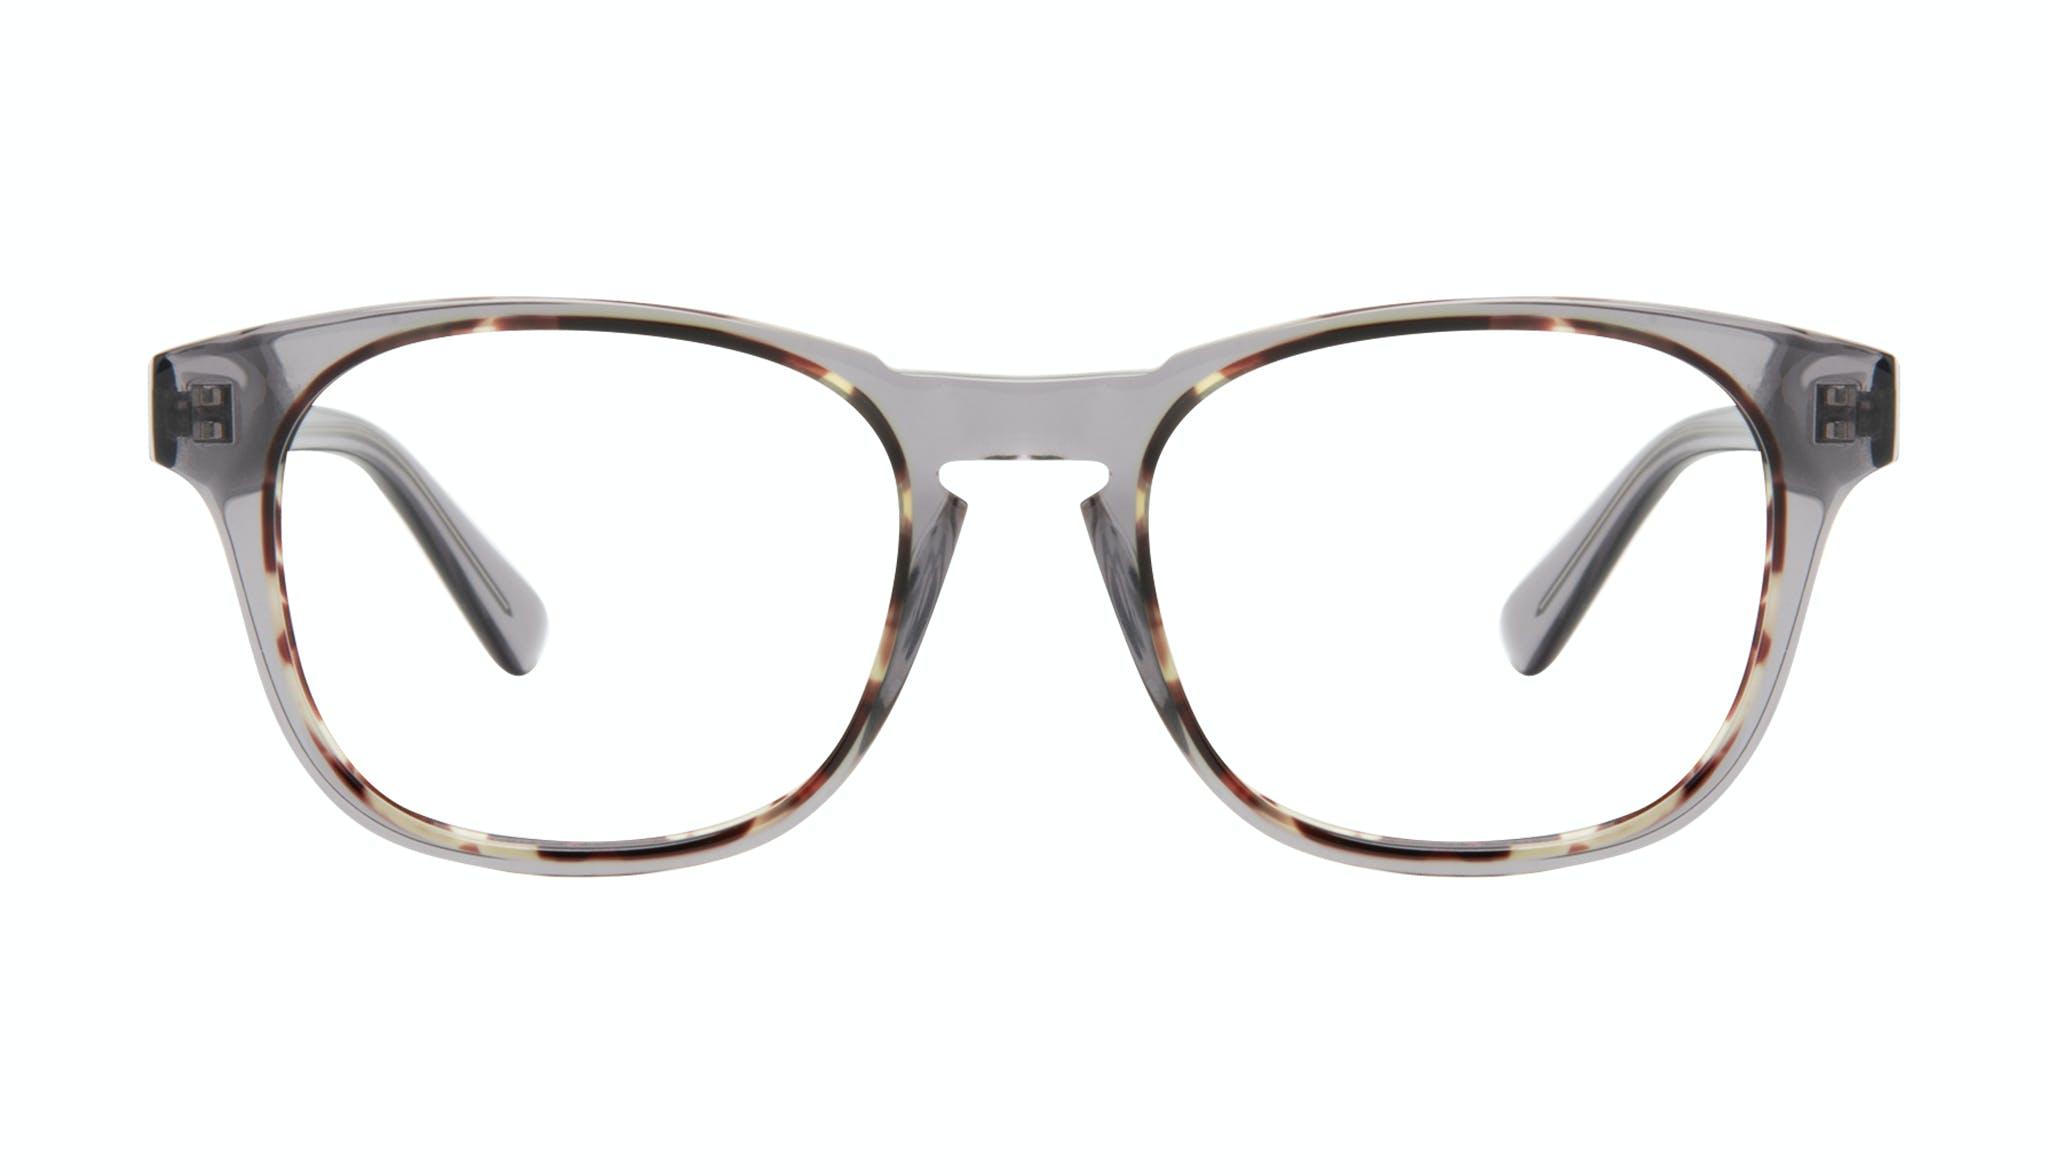 Affordable Fashion Glasses Square Eyeglasses Men Outline Smokey Tort Front